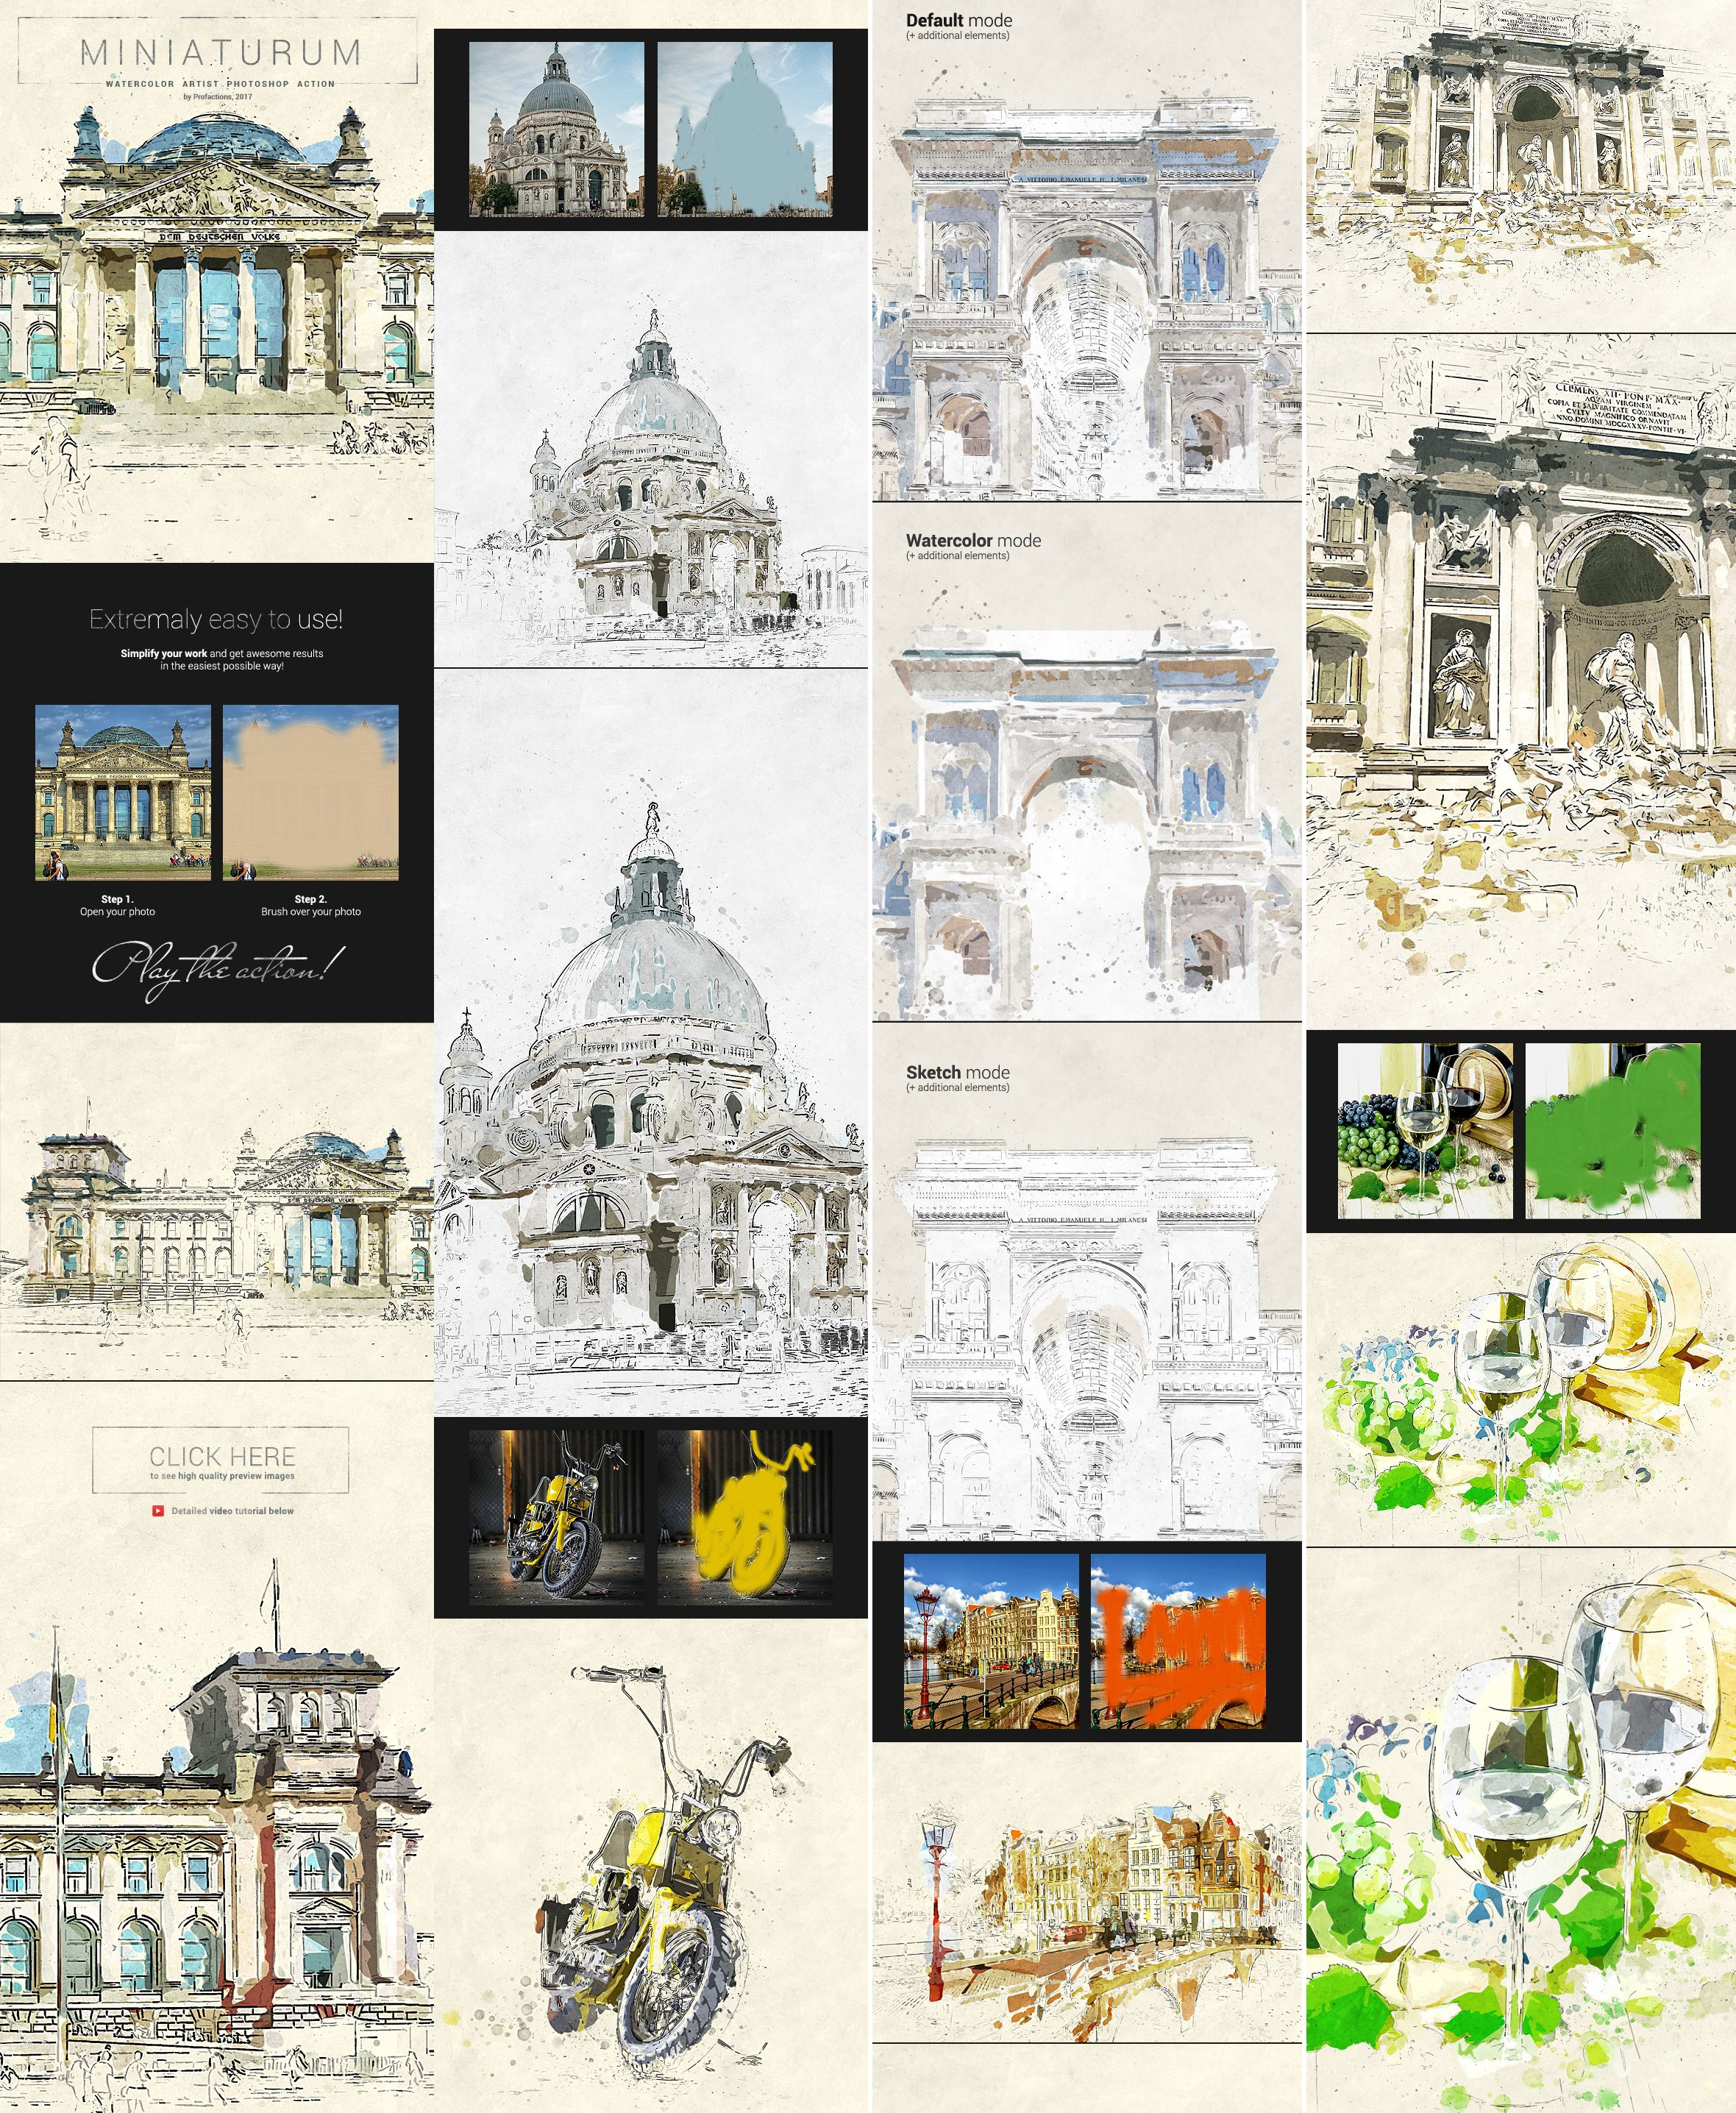 miniaturum - watercolor sketch photoshop action free download